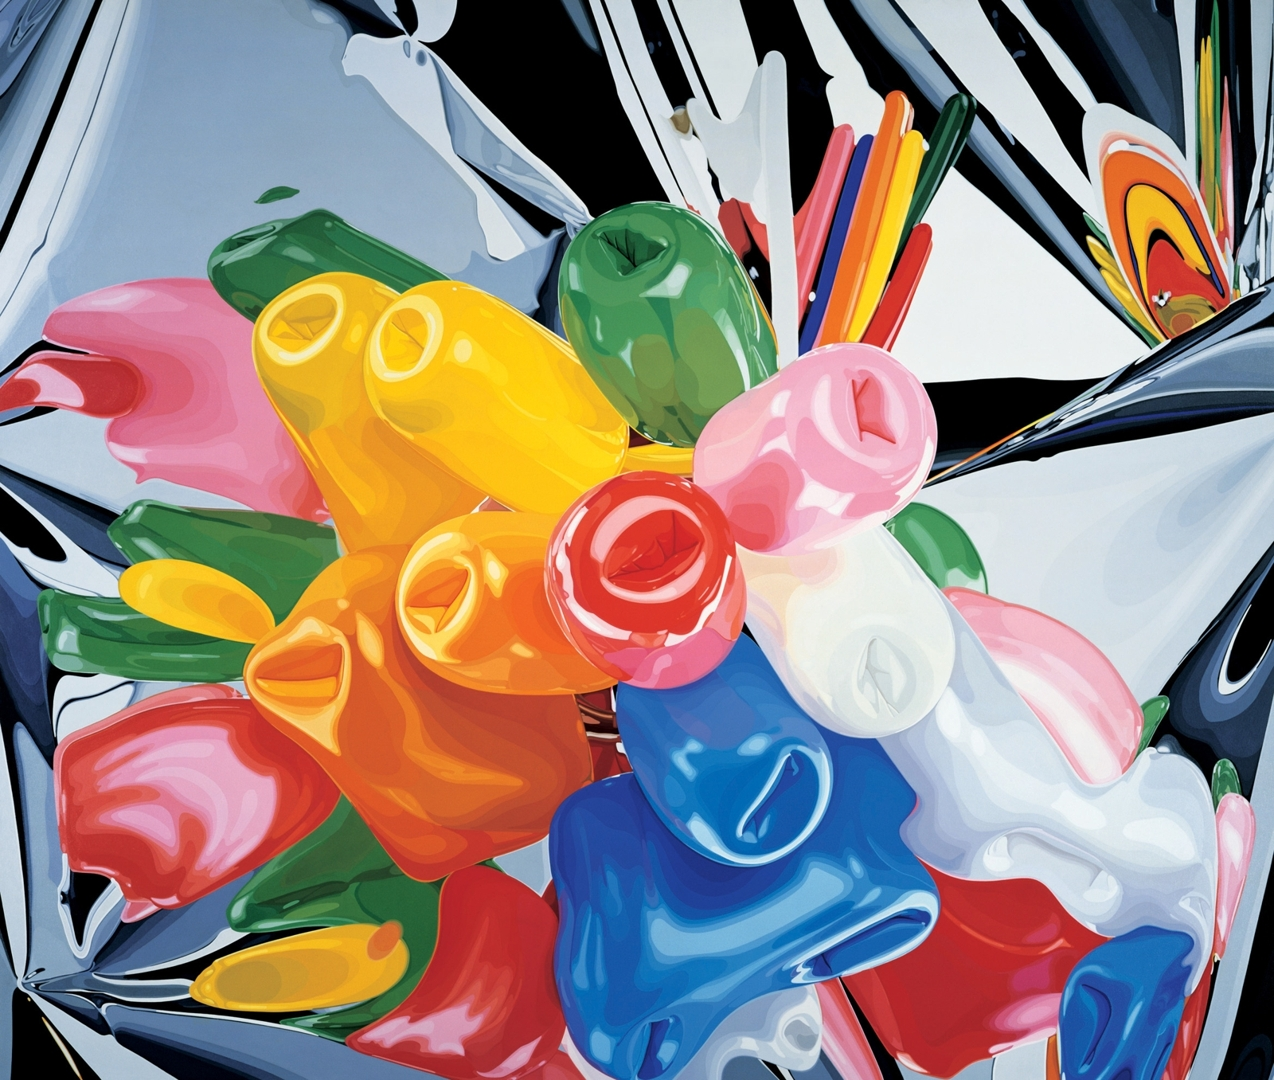 Jeff Koons: Celebration image